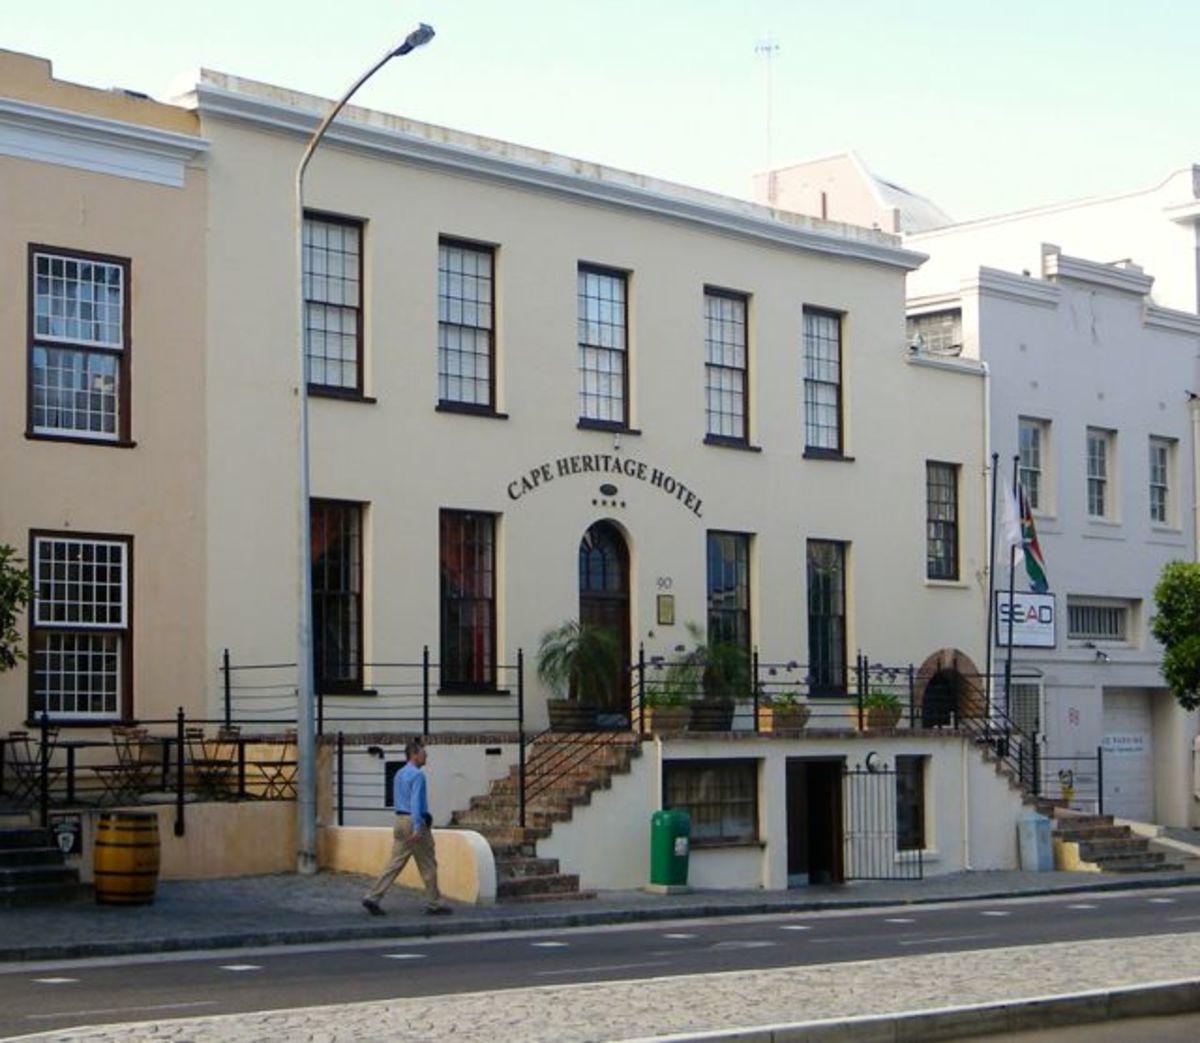 Cape Heritage Hotel in Cape Town